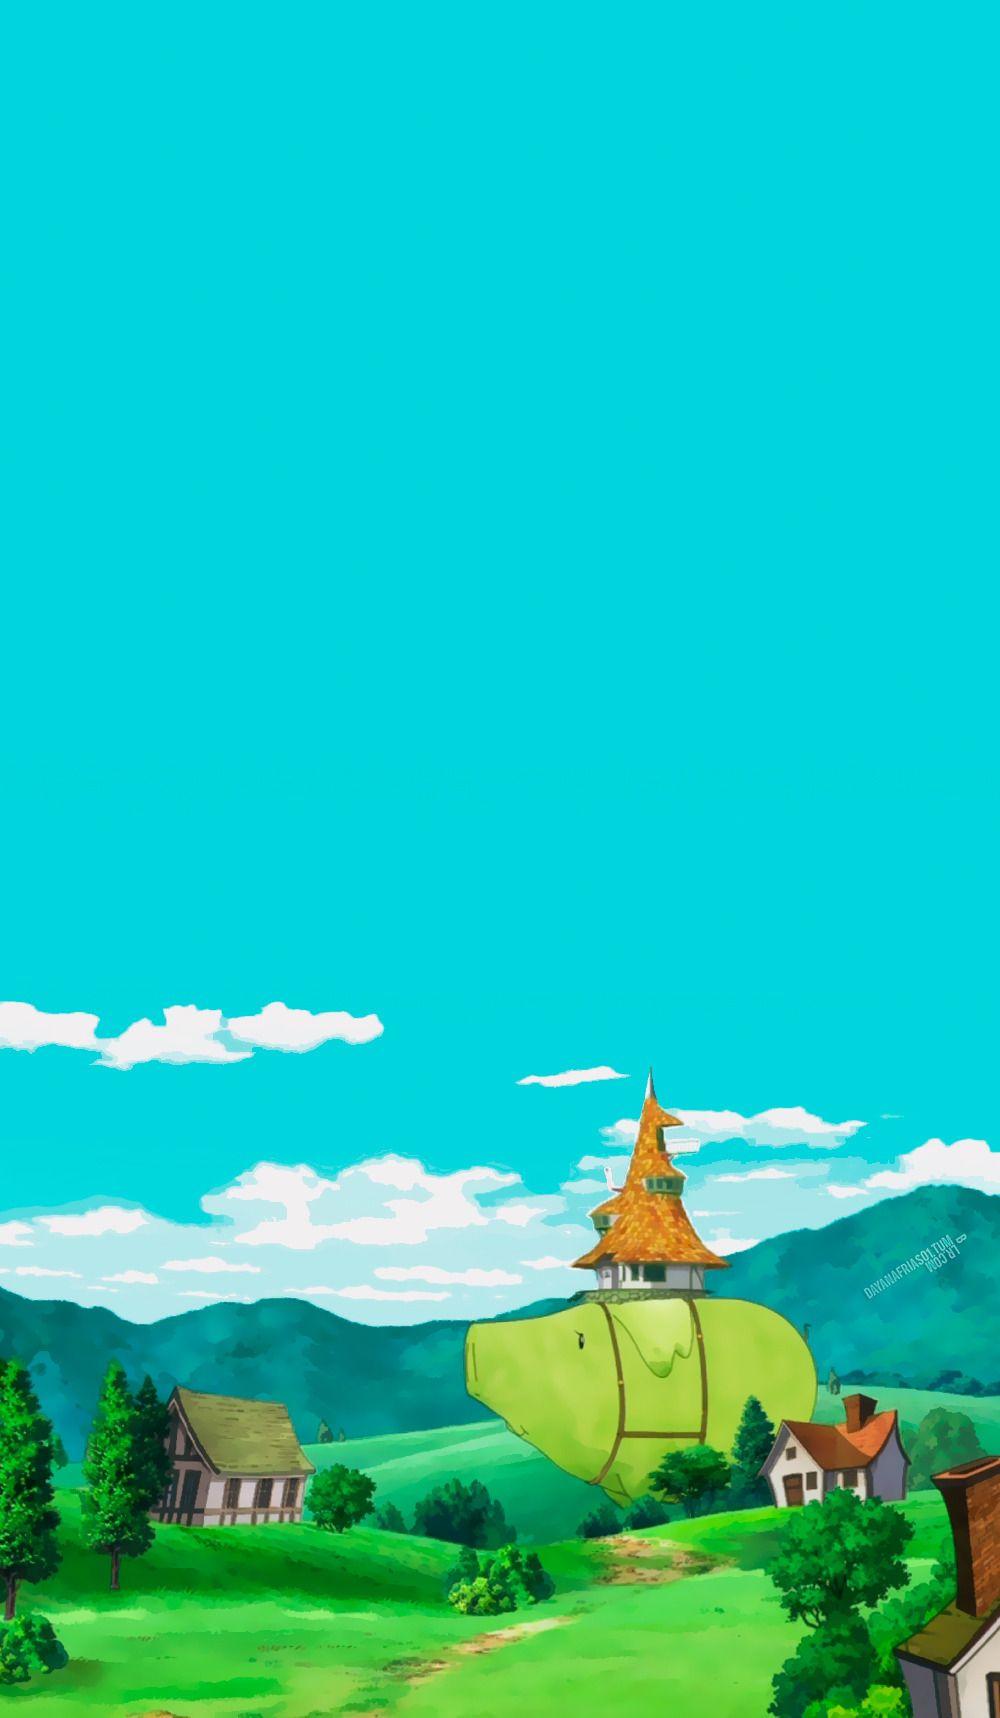 Wallpaper Fairy Tail Tumblr Anime Scenery Anime Scenery Wallpaper Anime Wallpaper